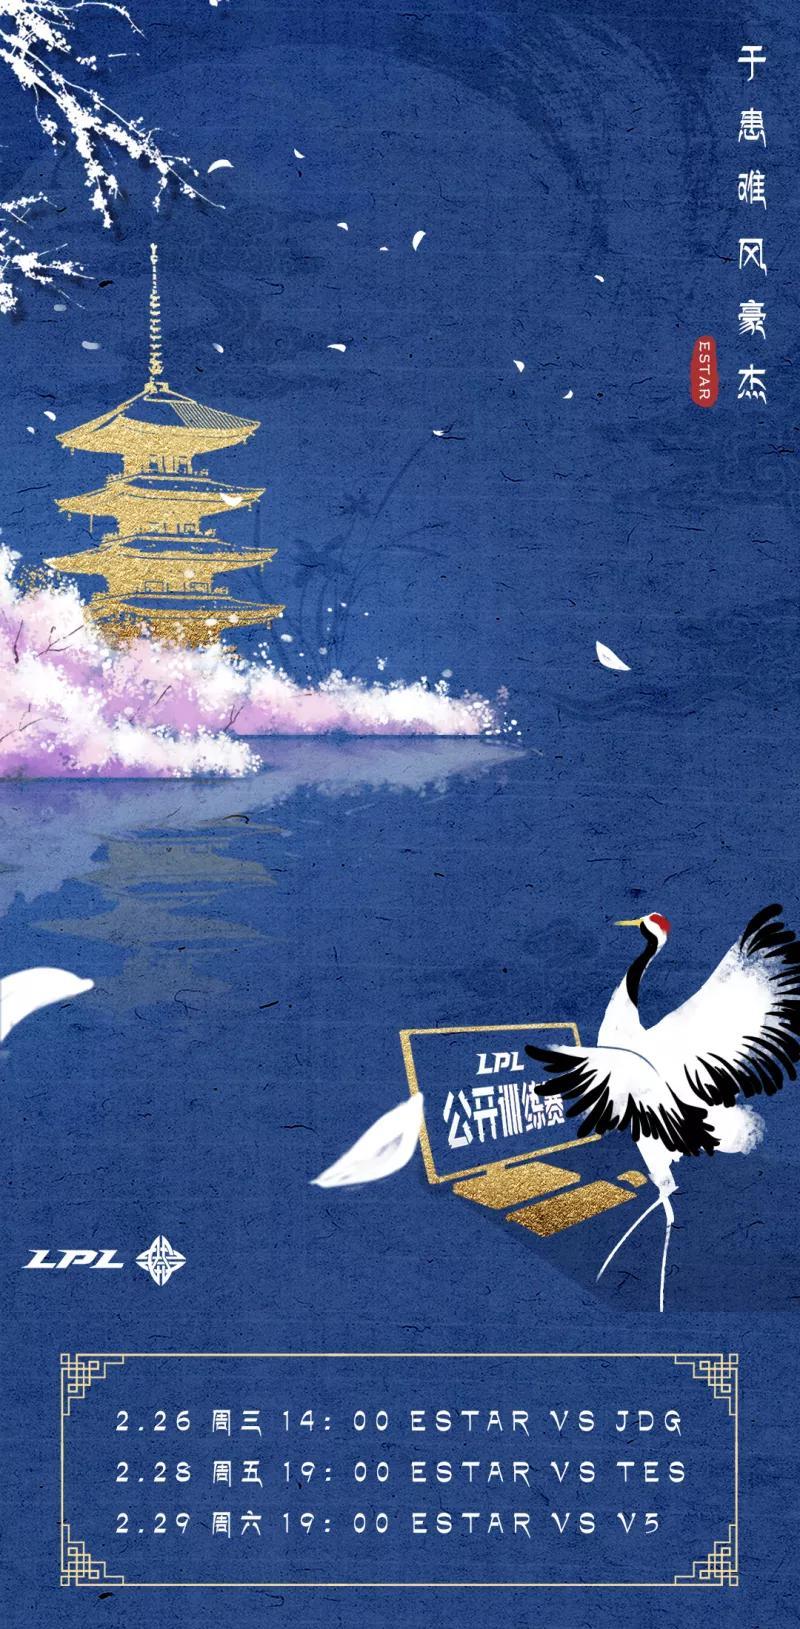 《LOL》ES公布首场LPL公开训练赛海报:于患难风豪杰